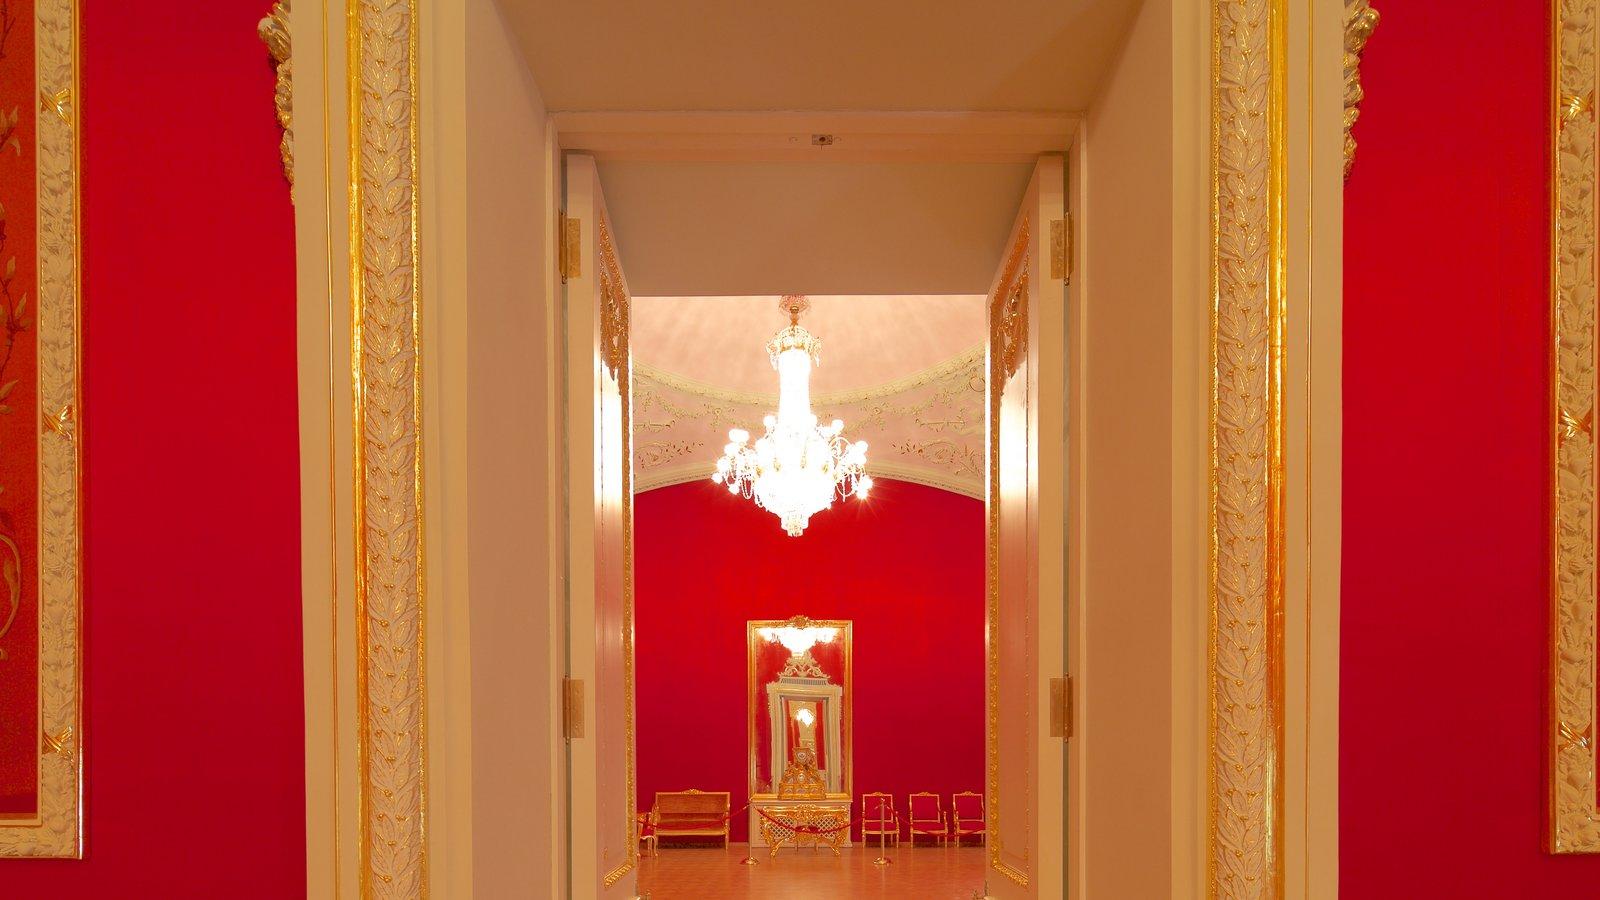 Teatro Bolshoi mostrando vistas internas e arquitetura de patrimônio